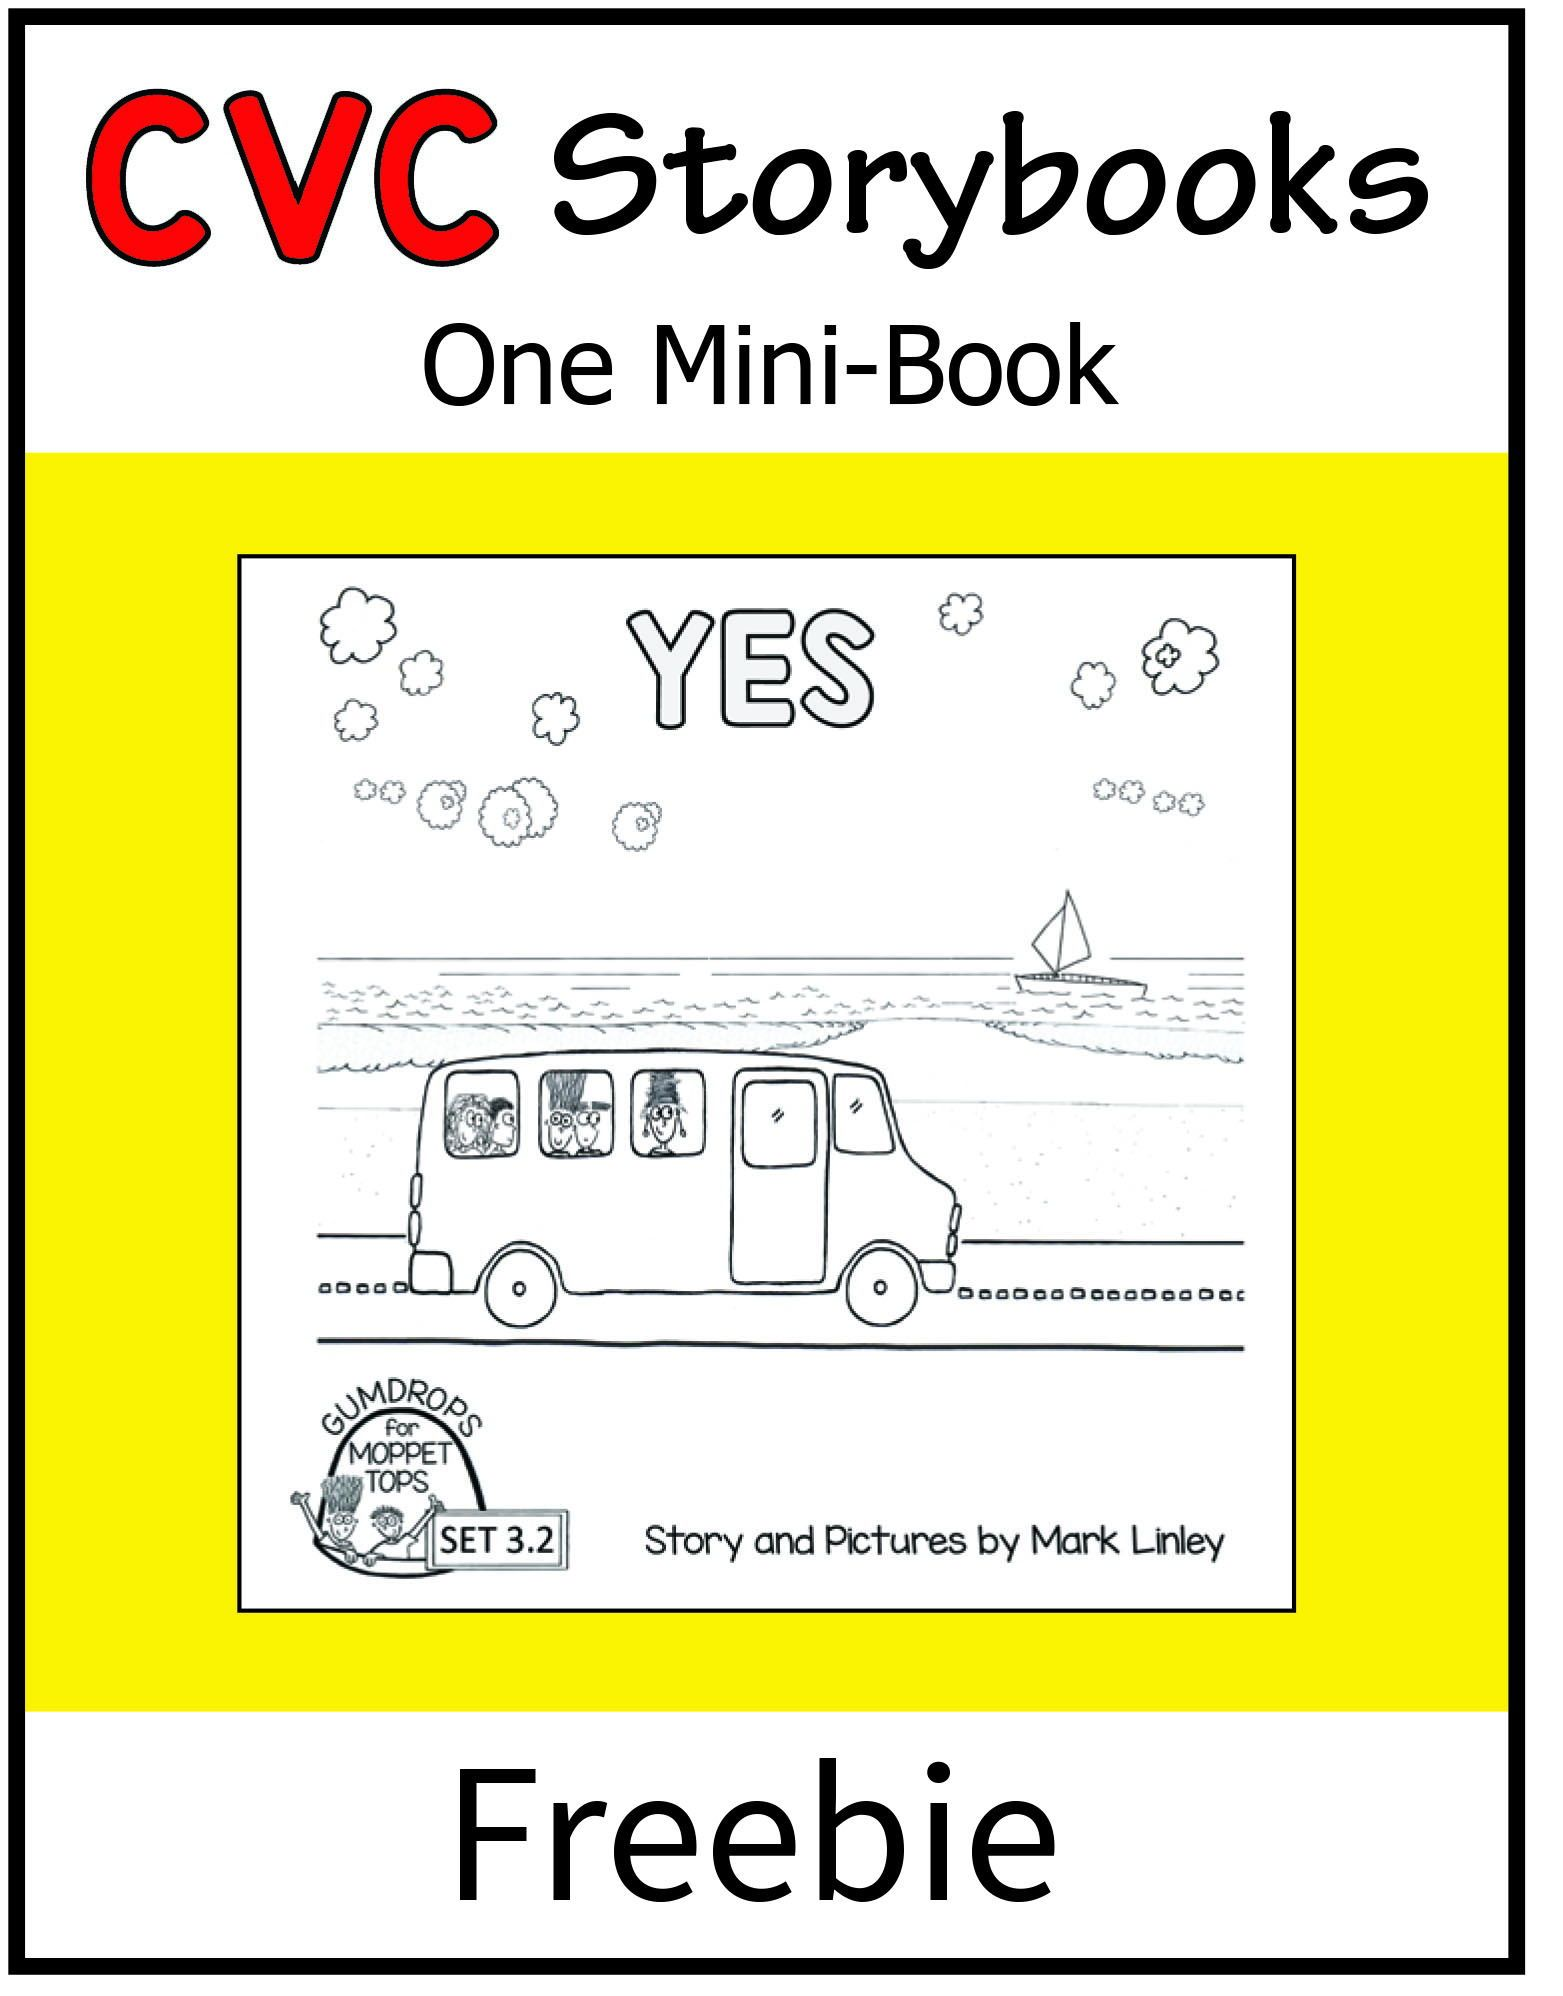 Cvc Storybook